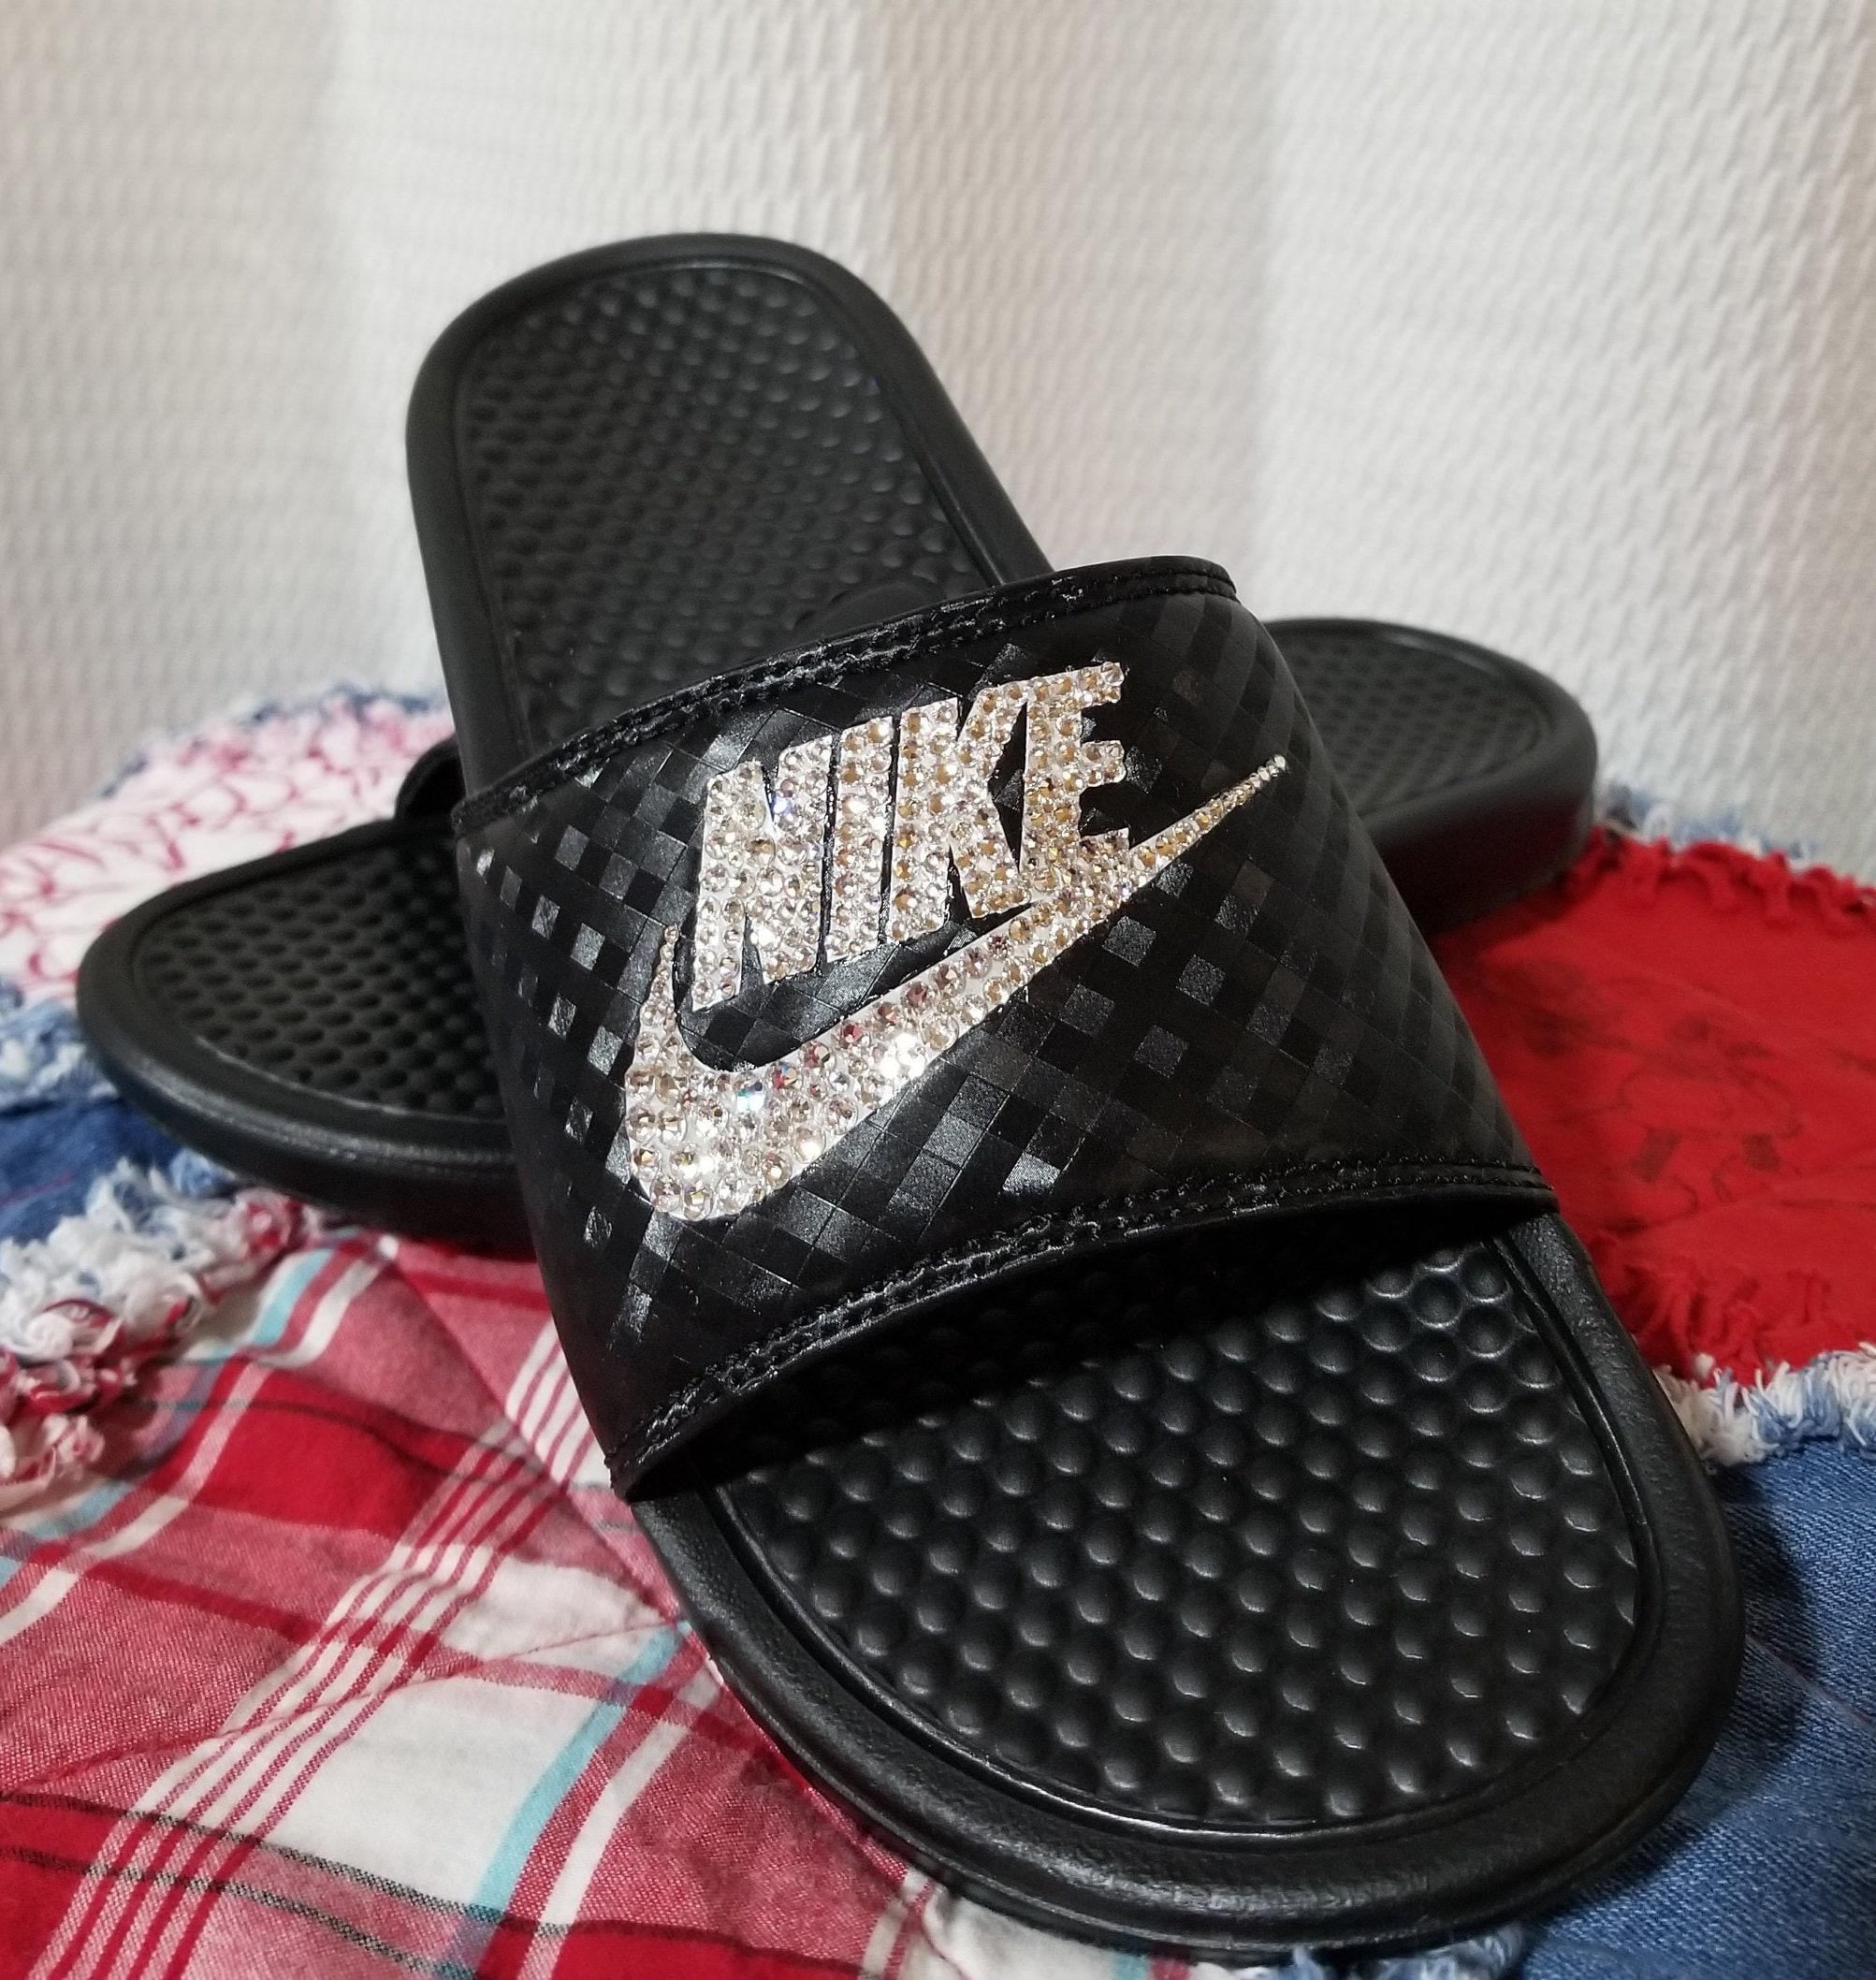 fbf0174ce Nike Benassi JDI Slides / Flip Flops / Customized Nike Slides with Swarovski  Crystals / Swarovski sandals / Swarovski flip flops / Softball .